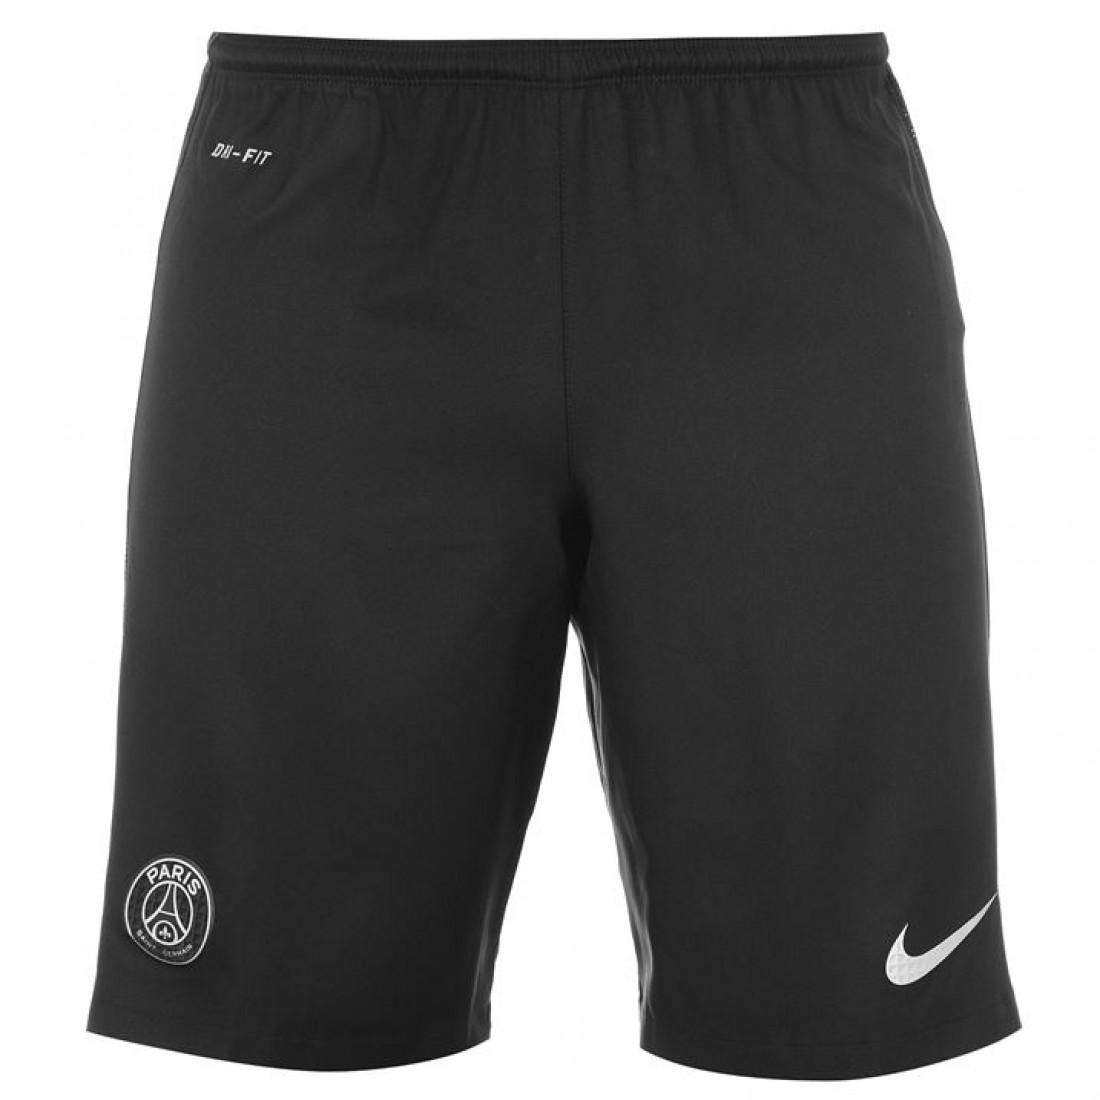 48e0d8d542b Nike PSG мъжки футболни шорти Париж Сен Жармен ПСЖ Paris St Germain Third  Shorts 2015 2016